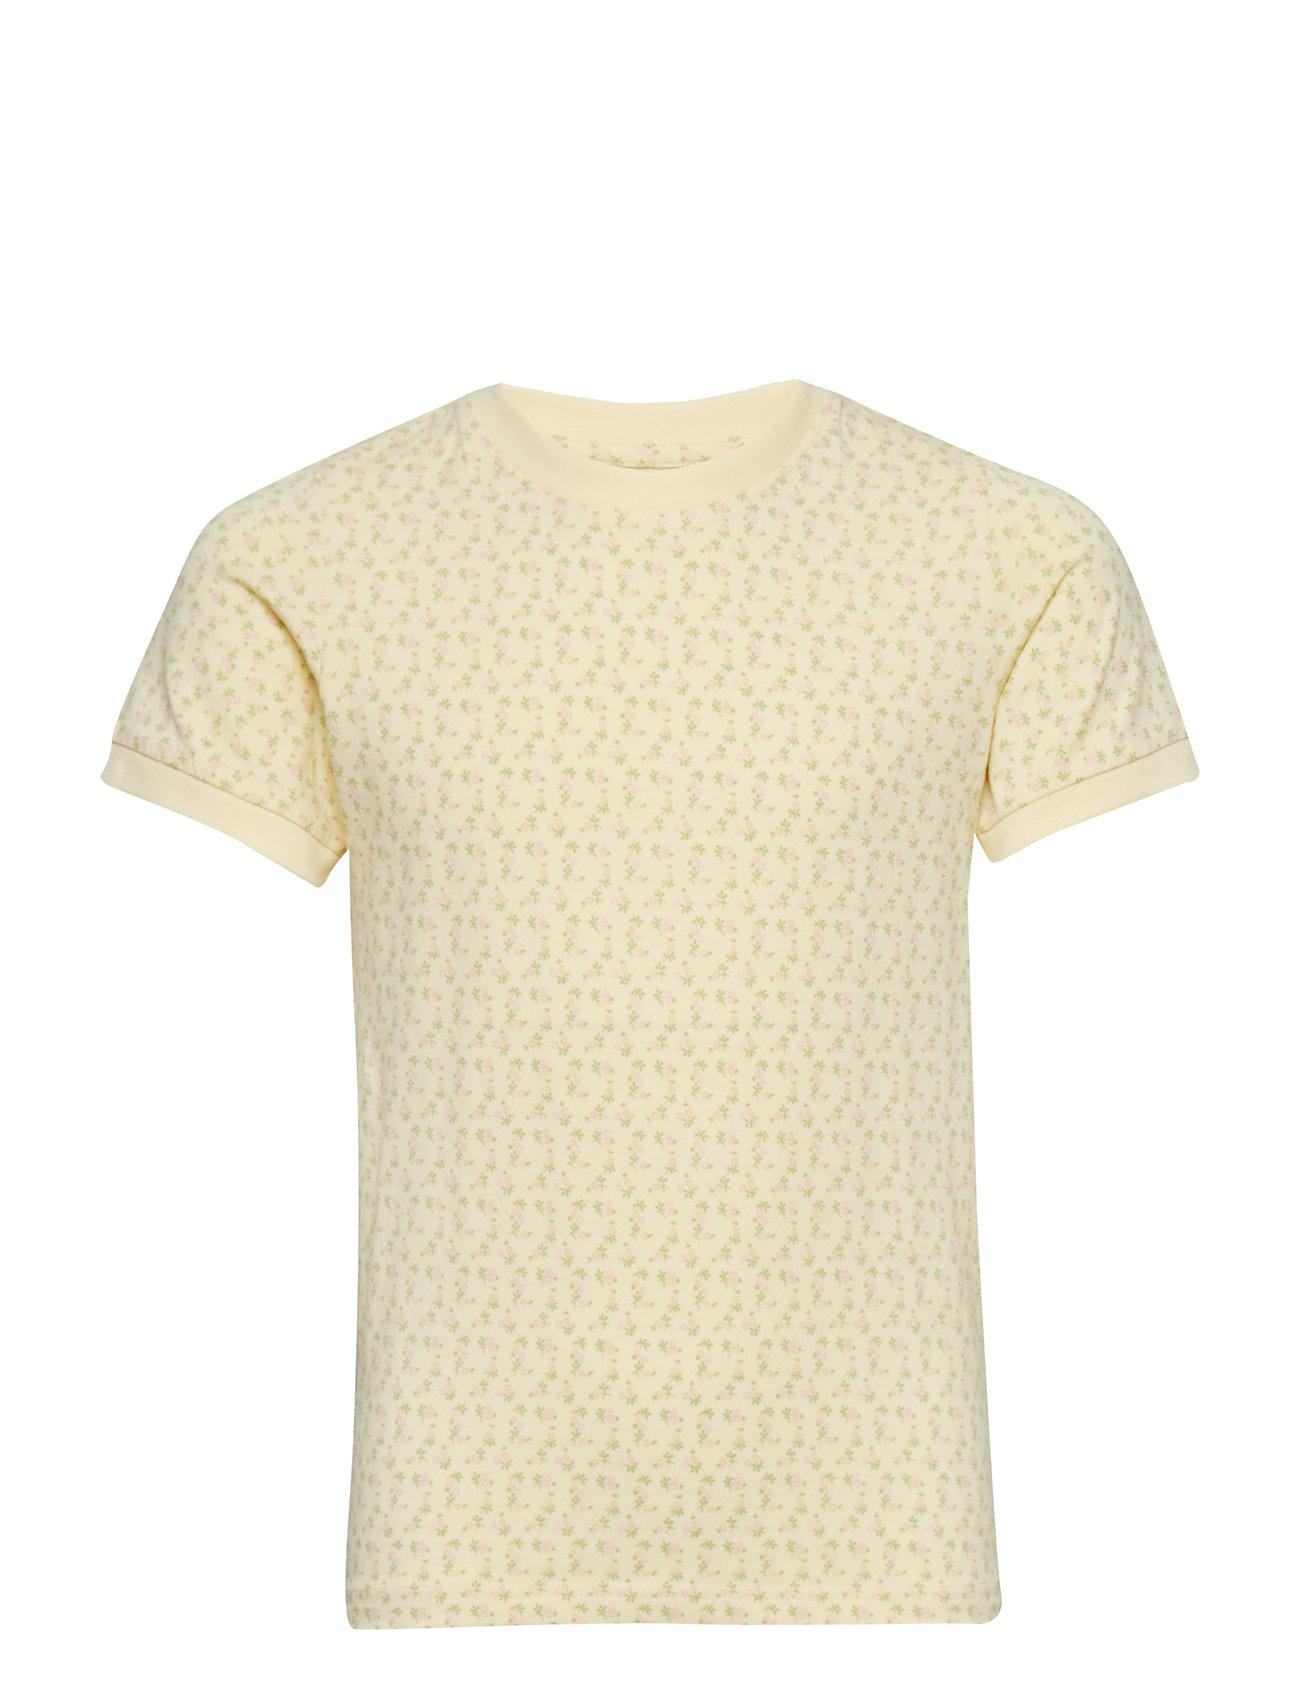 Mini A Ture Jeanica T-shirt, MK